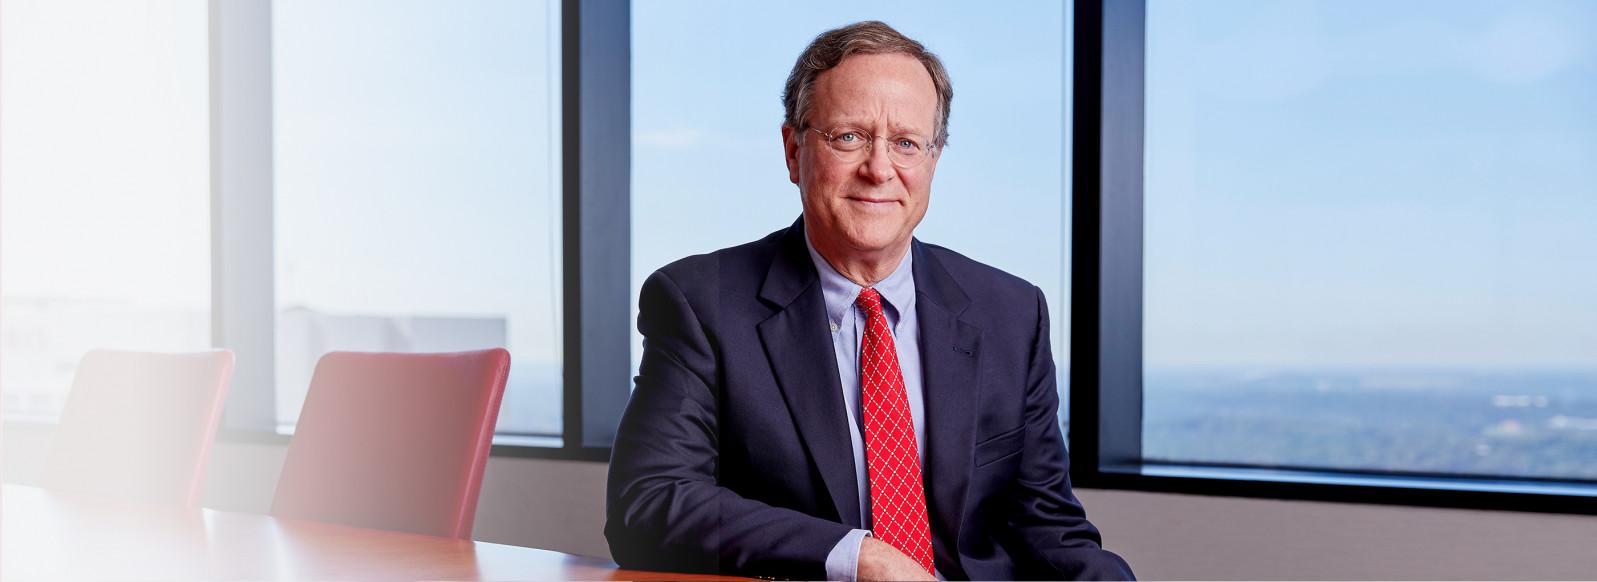 David G. Cleveland